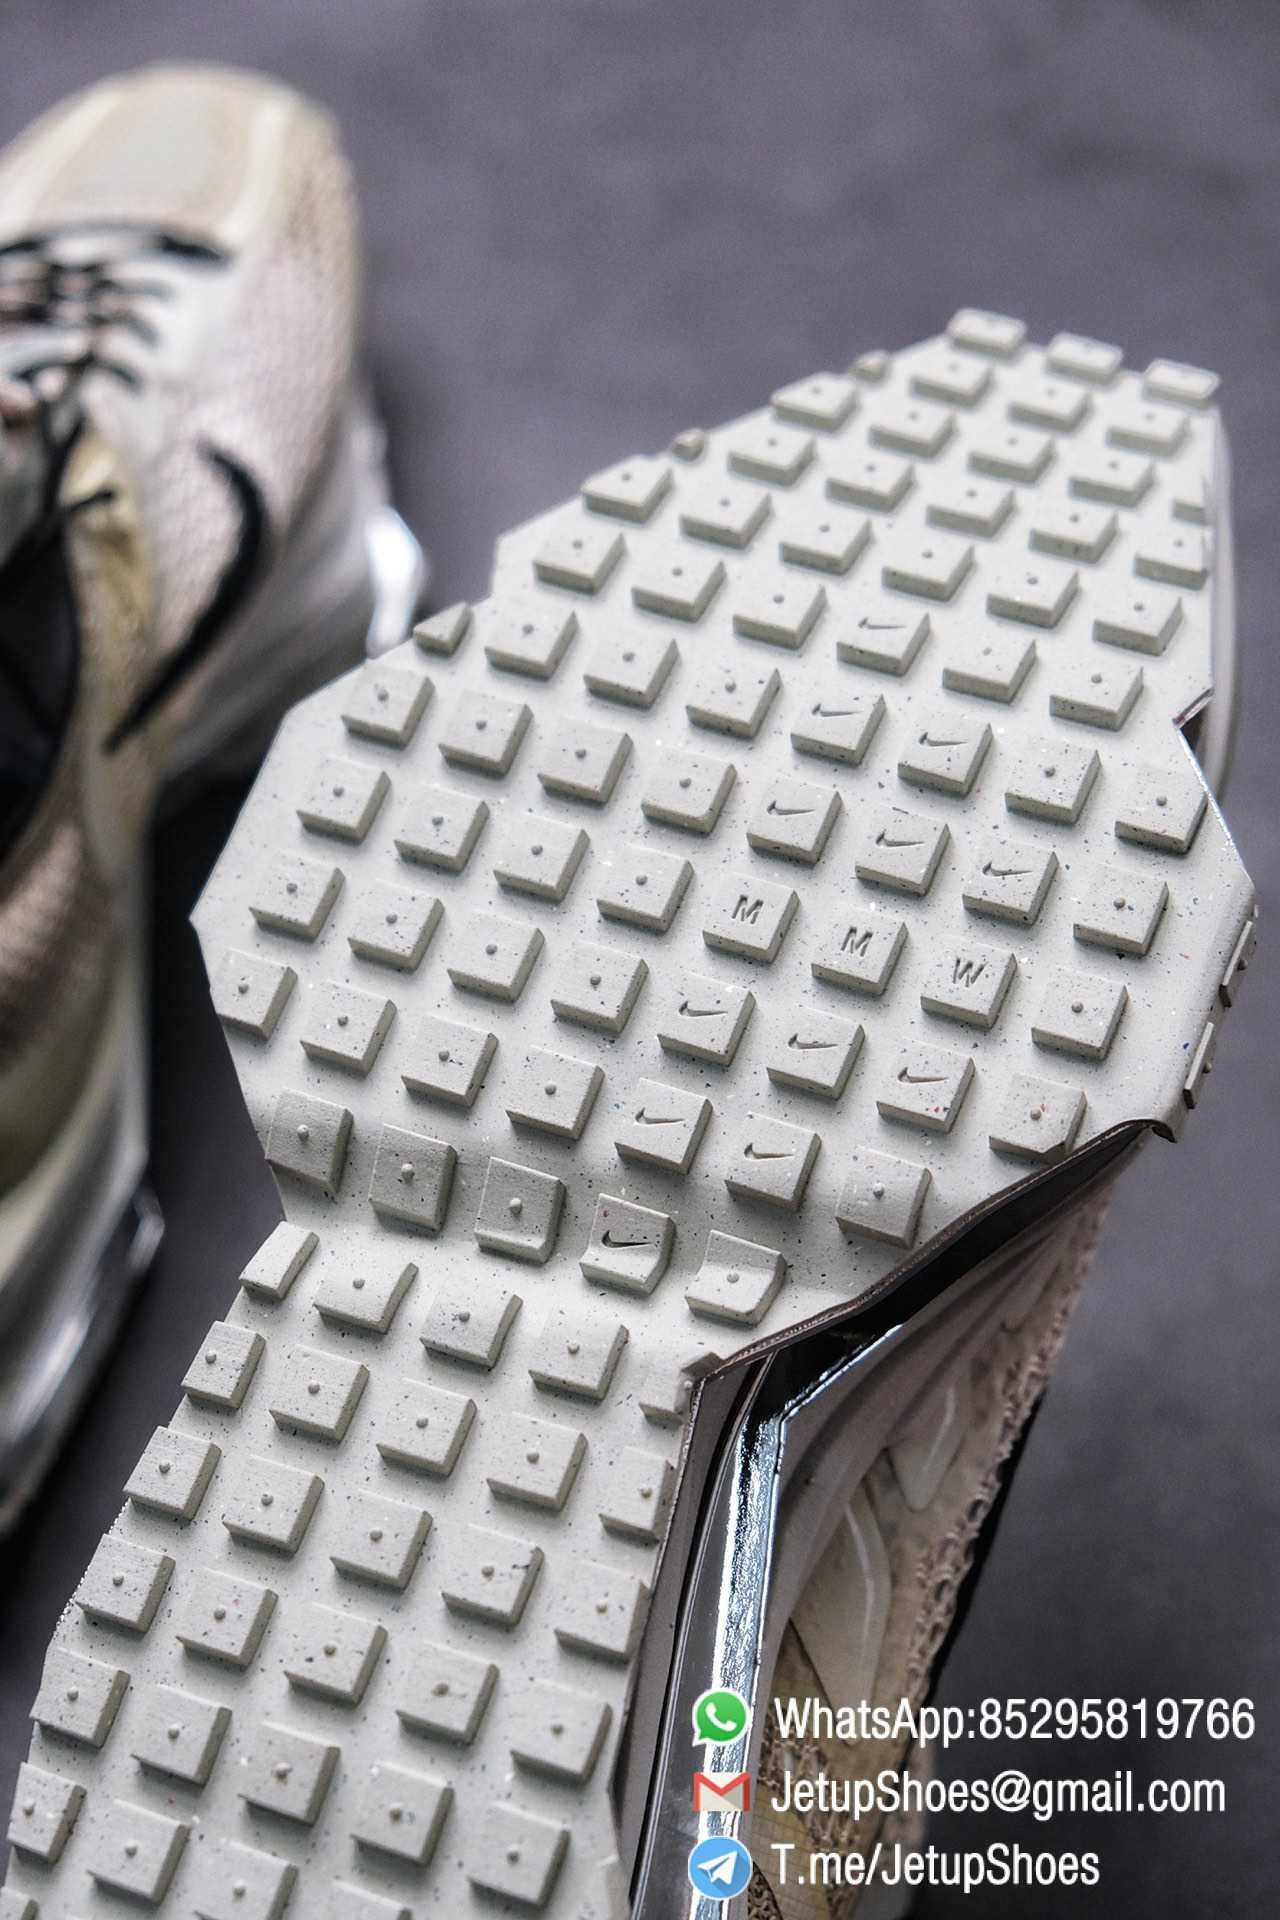 Best Replica Sneakers Matthew M Williams x Nike Zoom 004 Stone CU0676 200 Top Sneakers 013